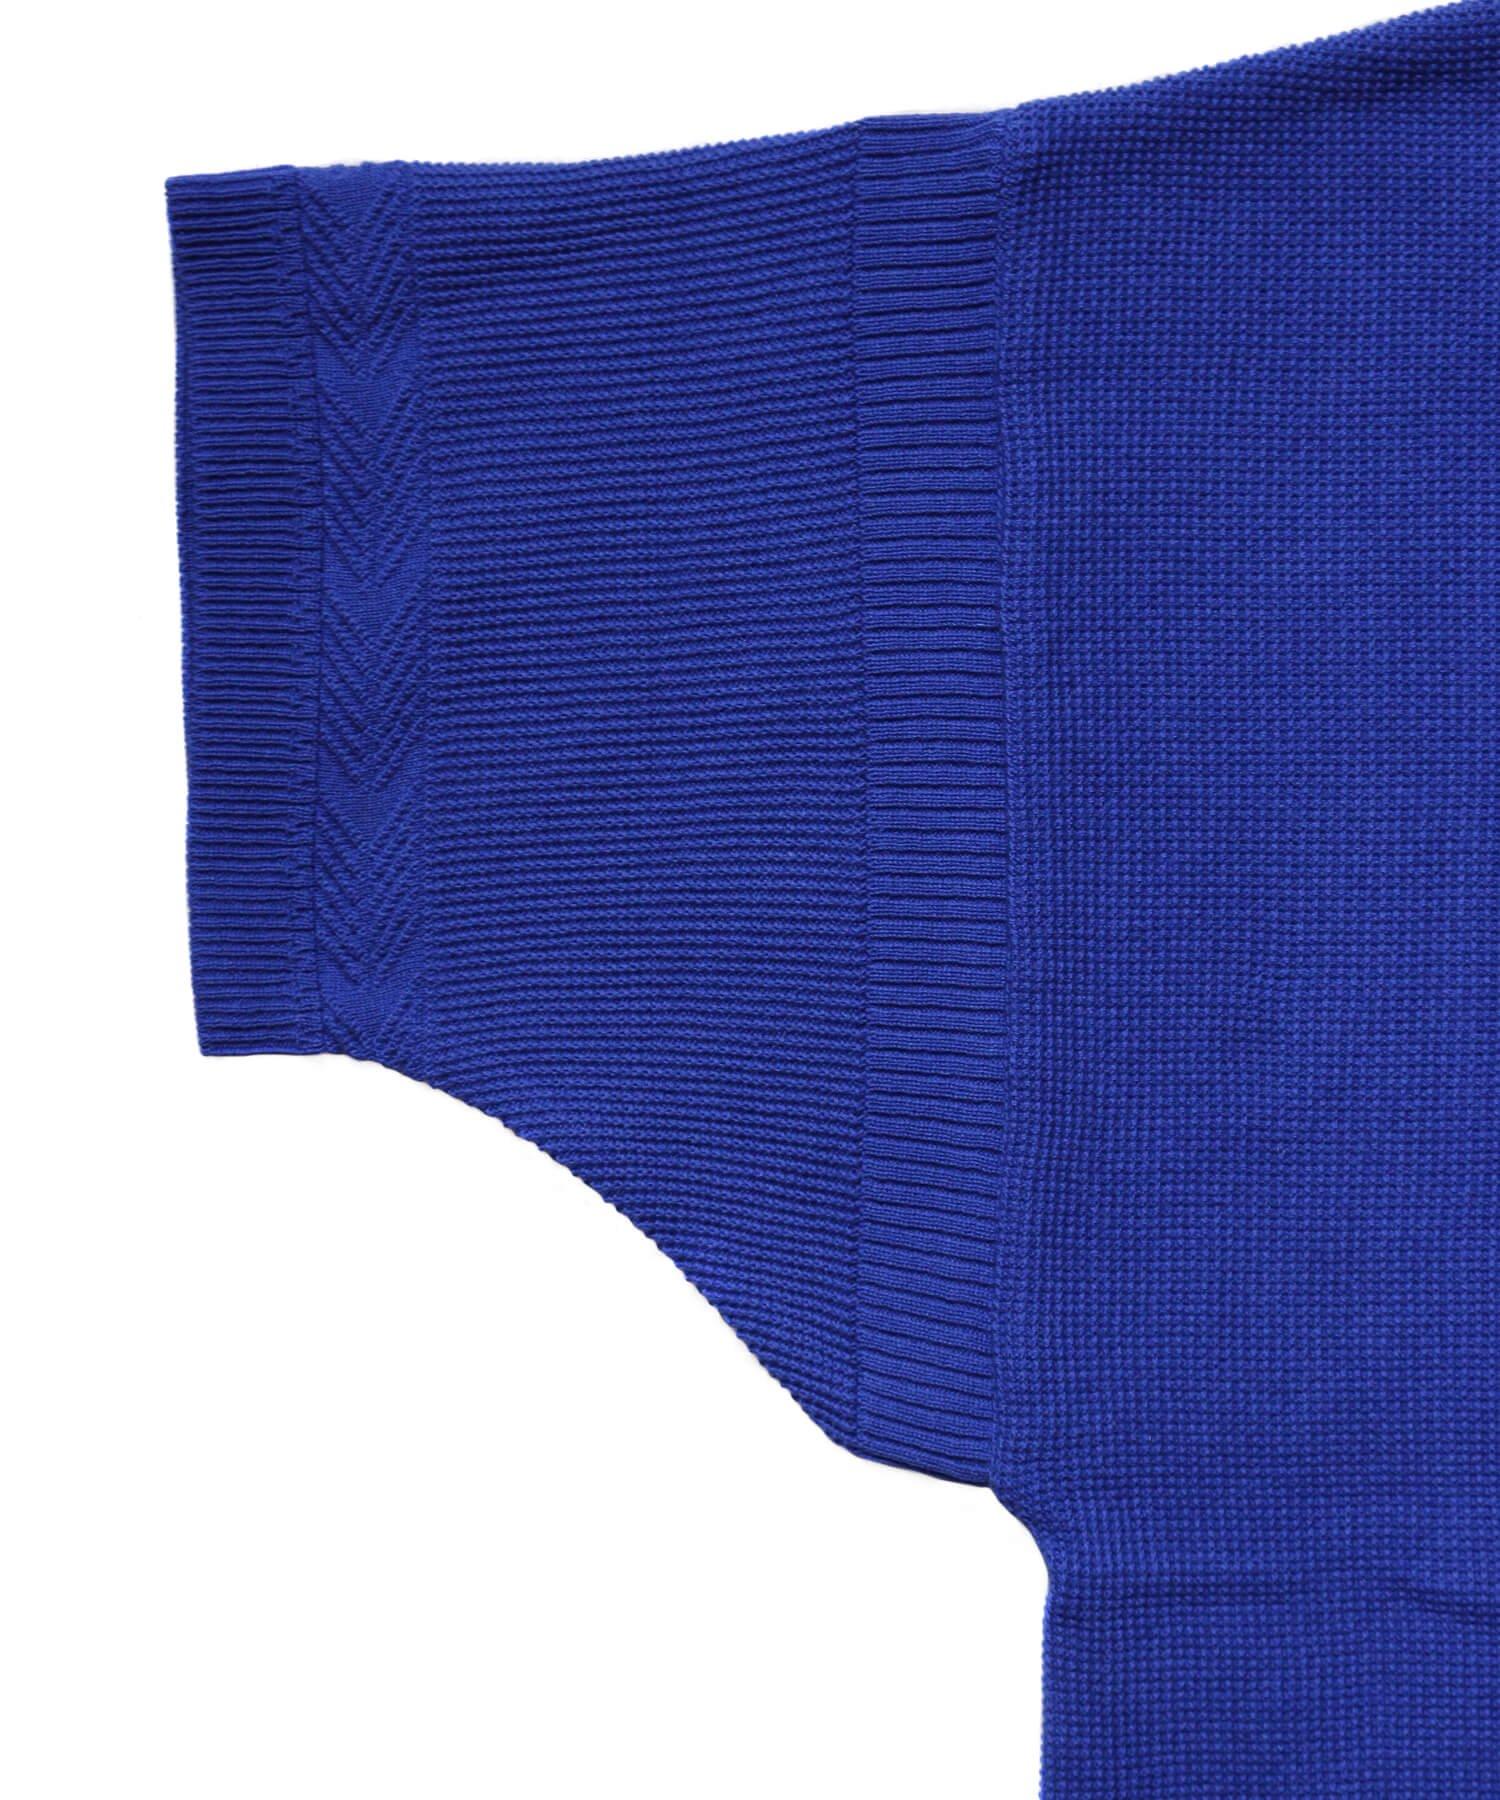 YASHIKI / ヤシキ |YASHIKI / ヤシキ × SIDEMILITIA inc. / サイドミリティア  RYUREI KNIT (LIMITED BLUE/WOMEN'S) 商品画像5